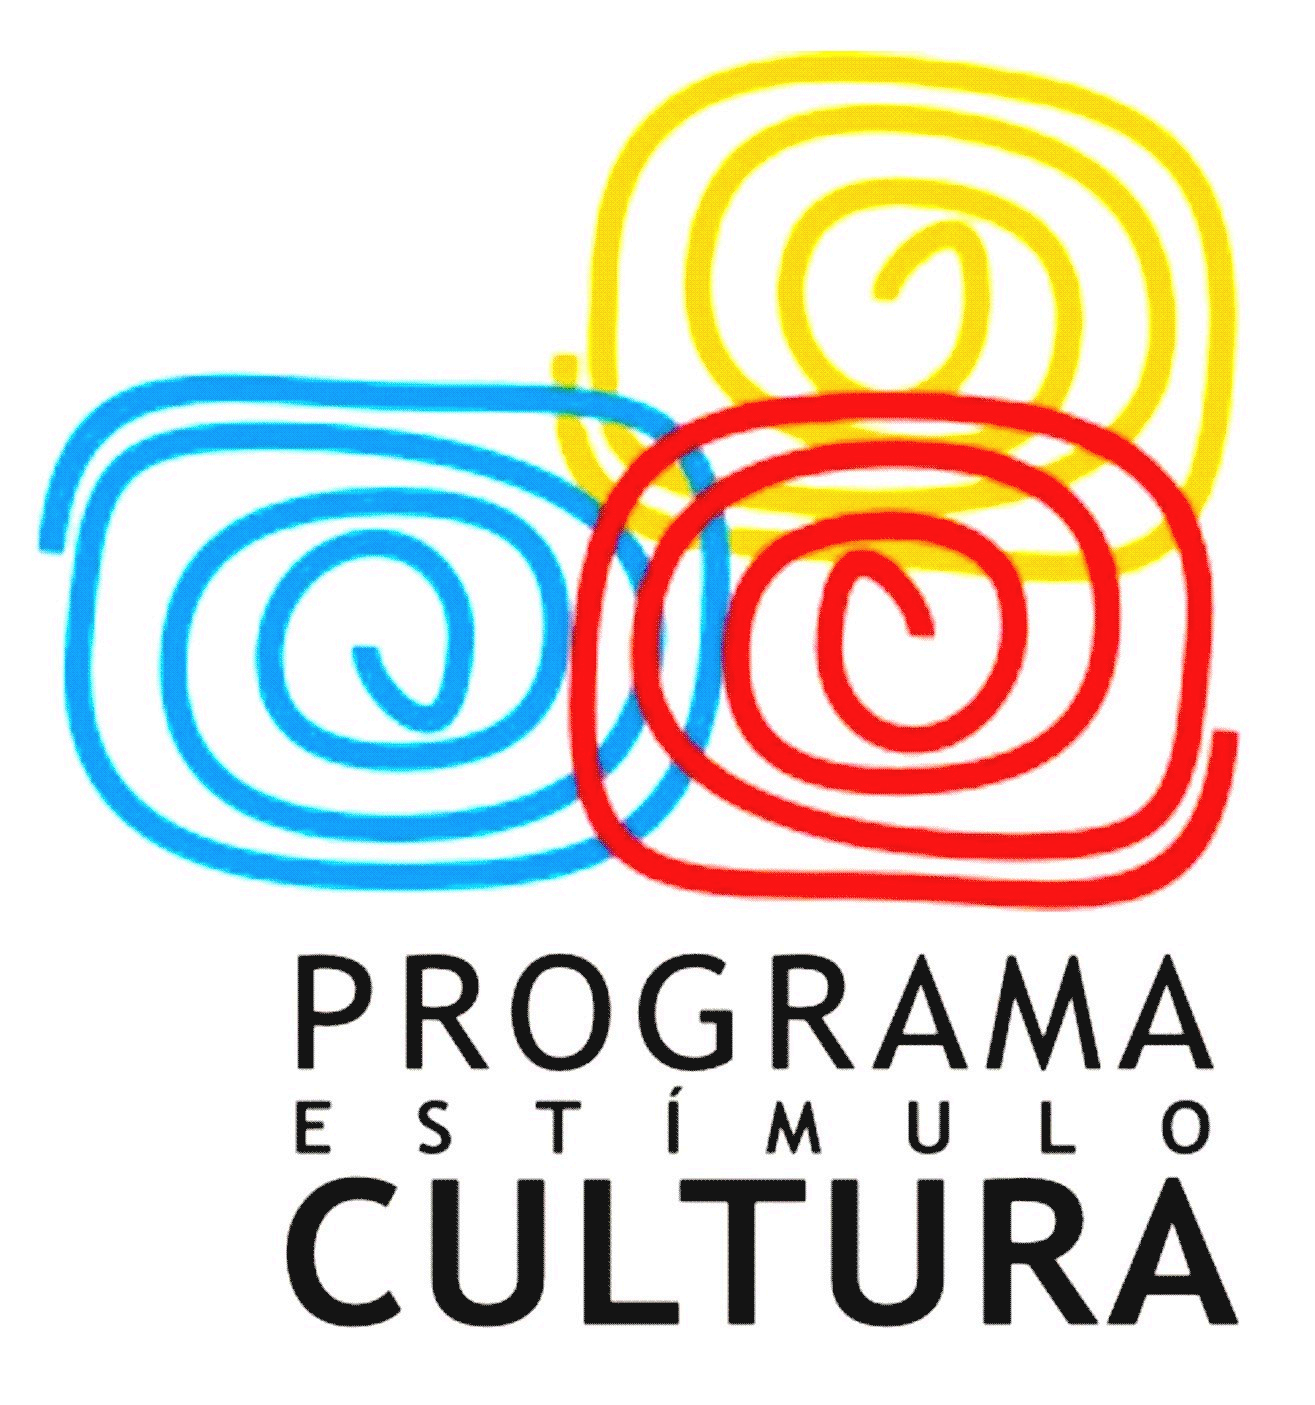 Programa de Estímulo à Cultura